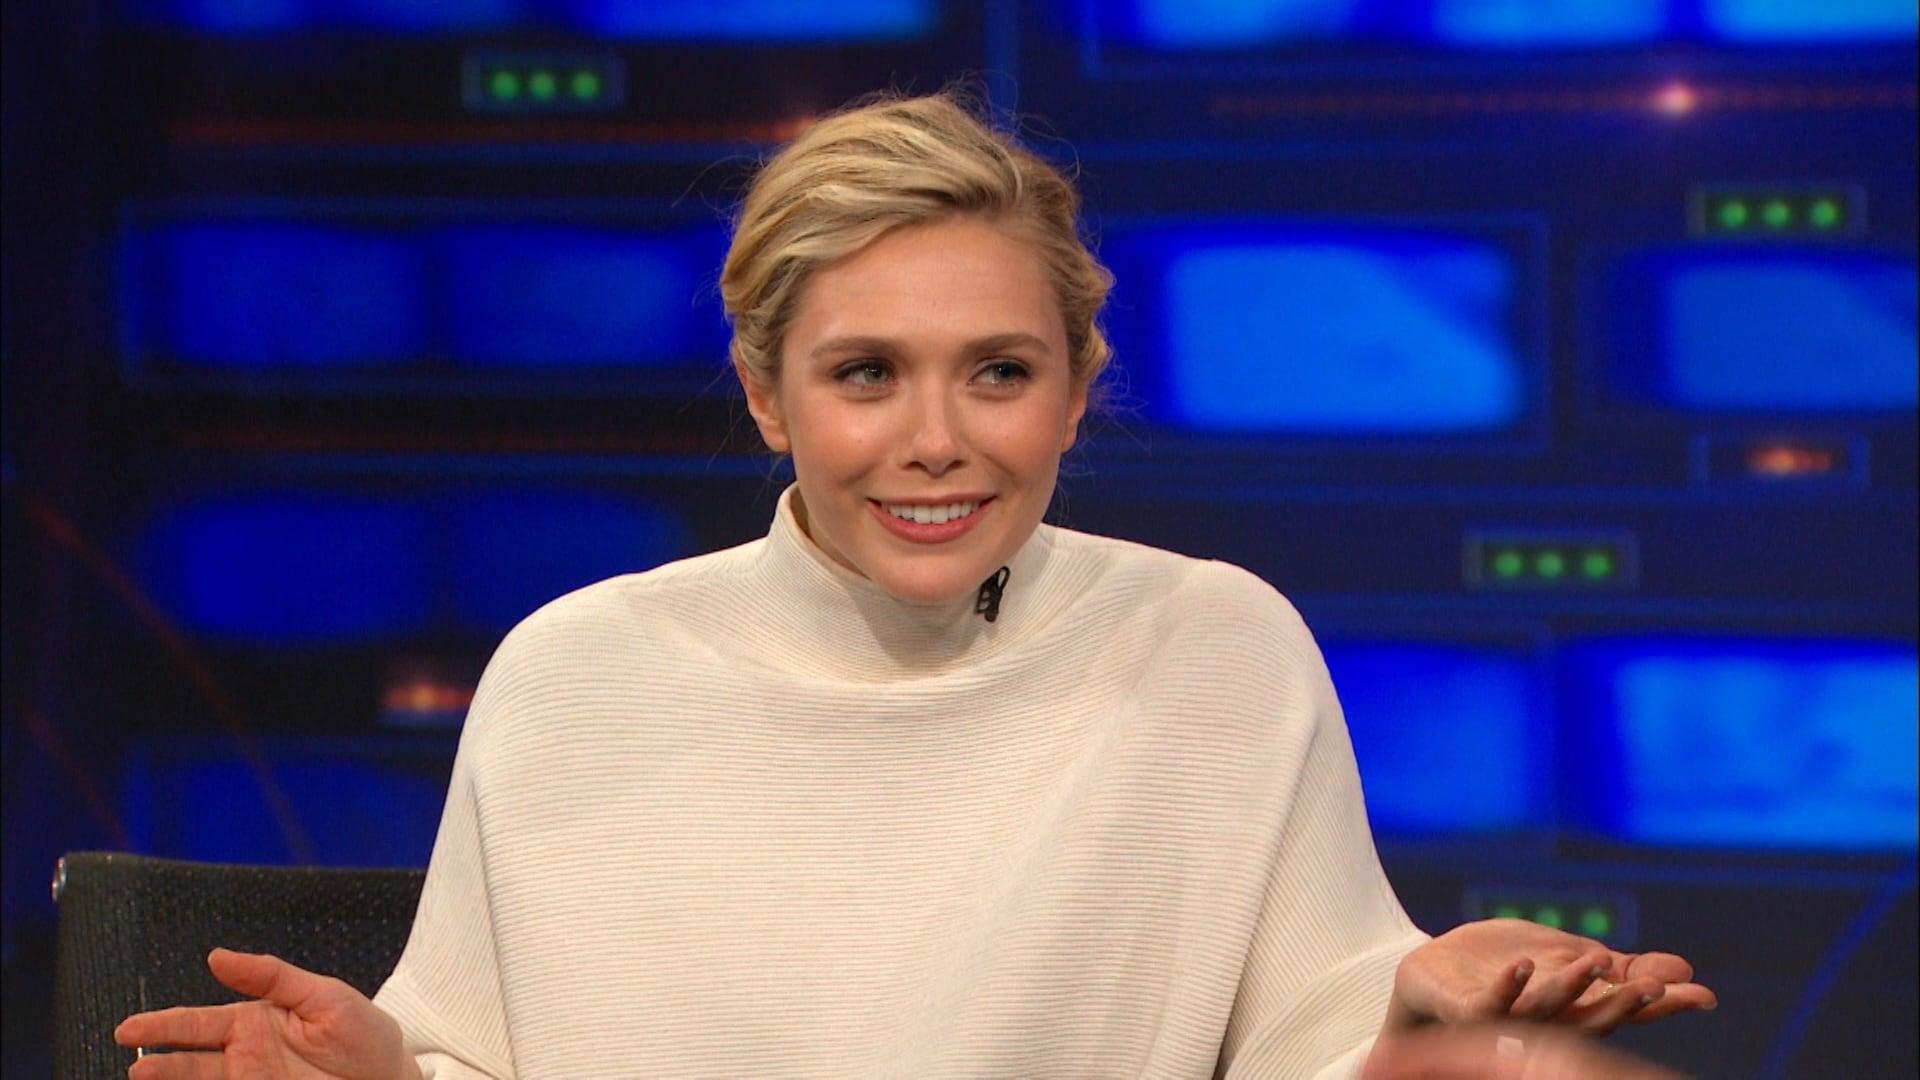 The Daily Show with Trevor Noah Season 20 :Episode 96  Elizabeth Olsen